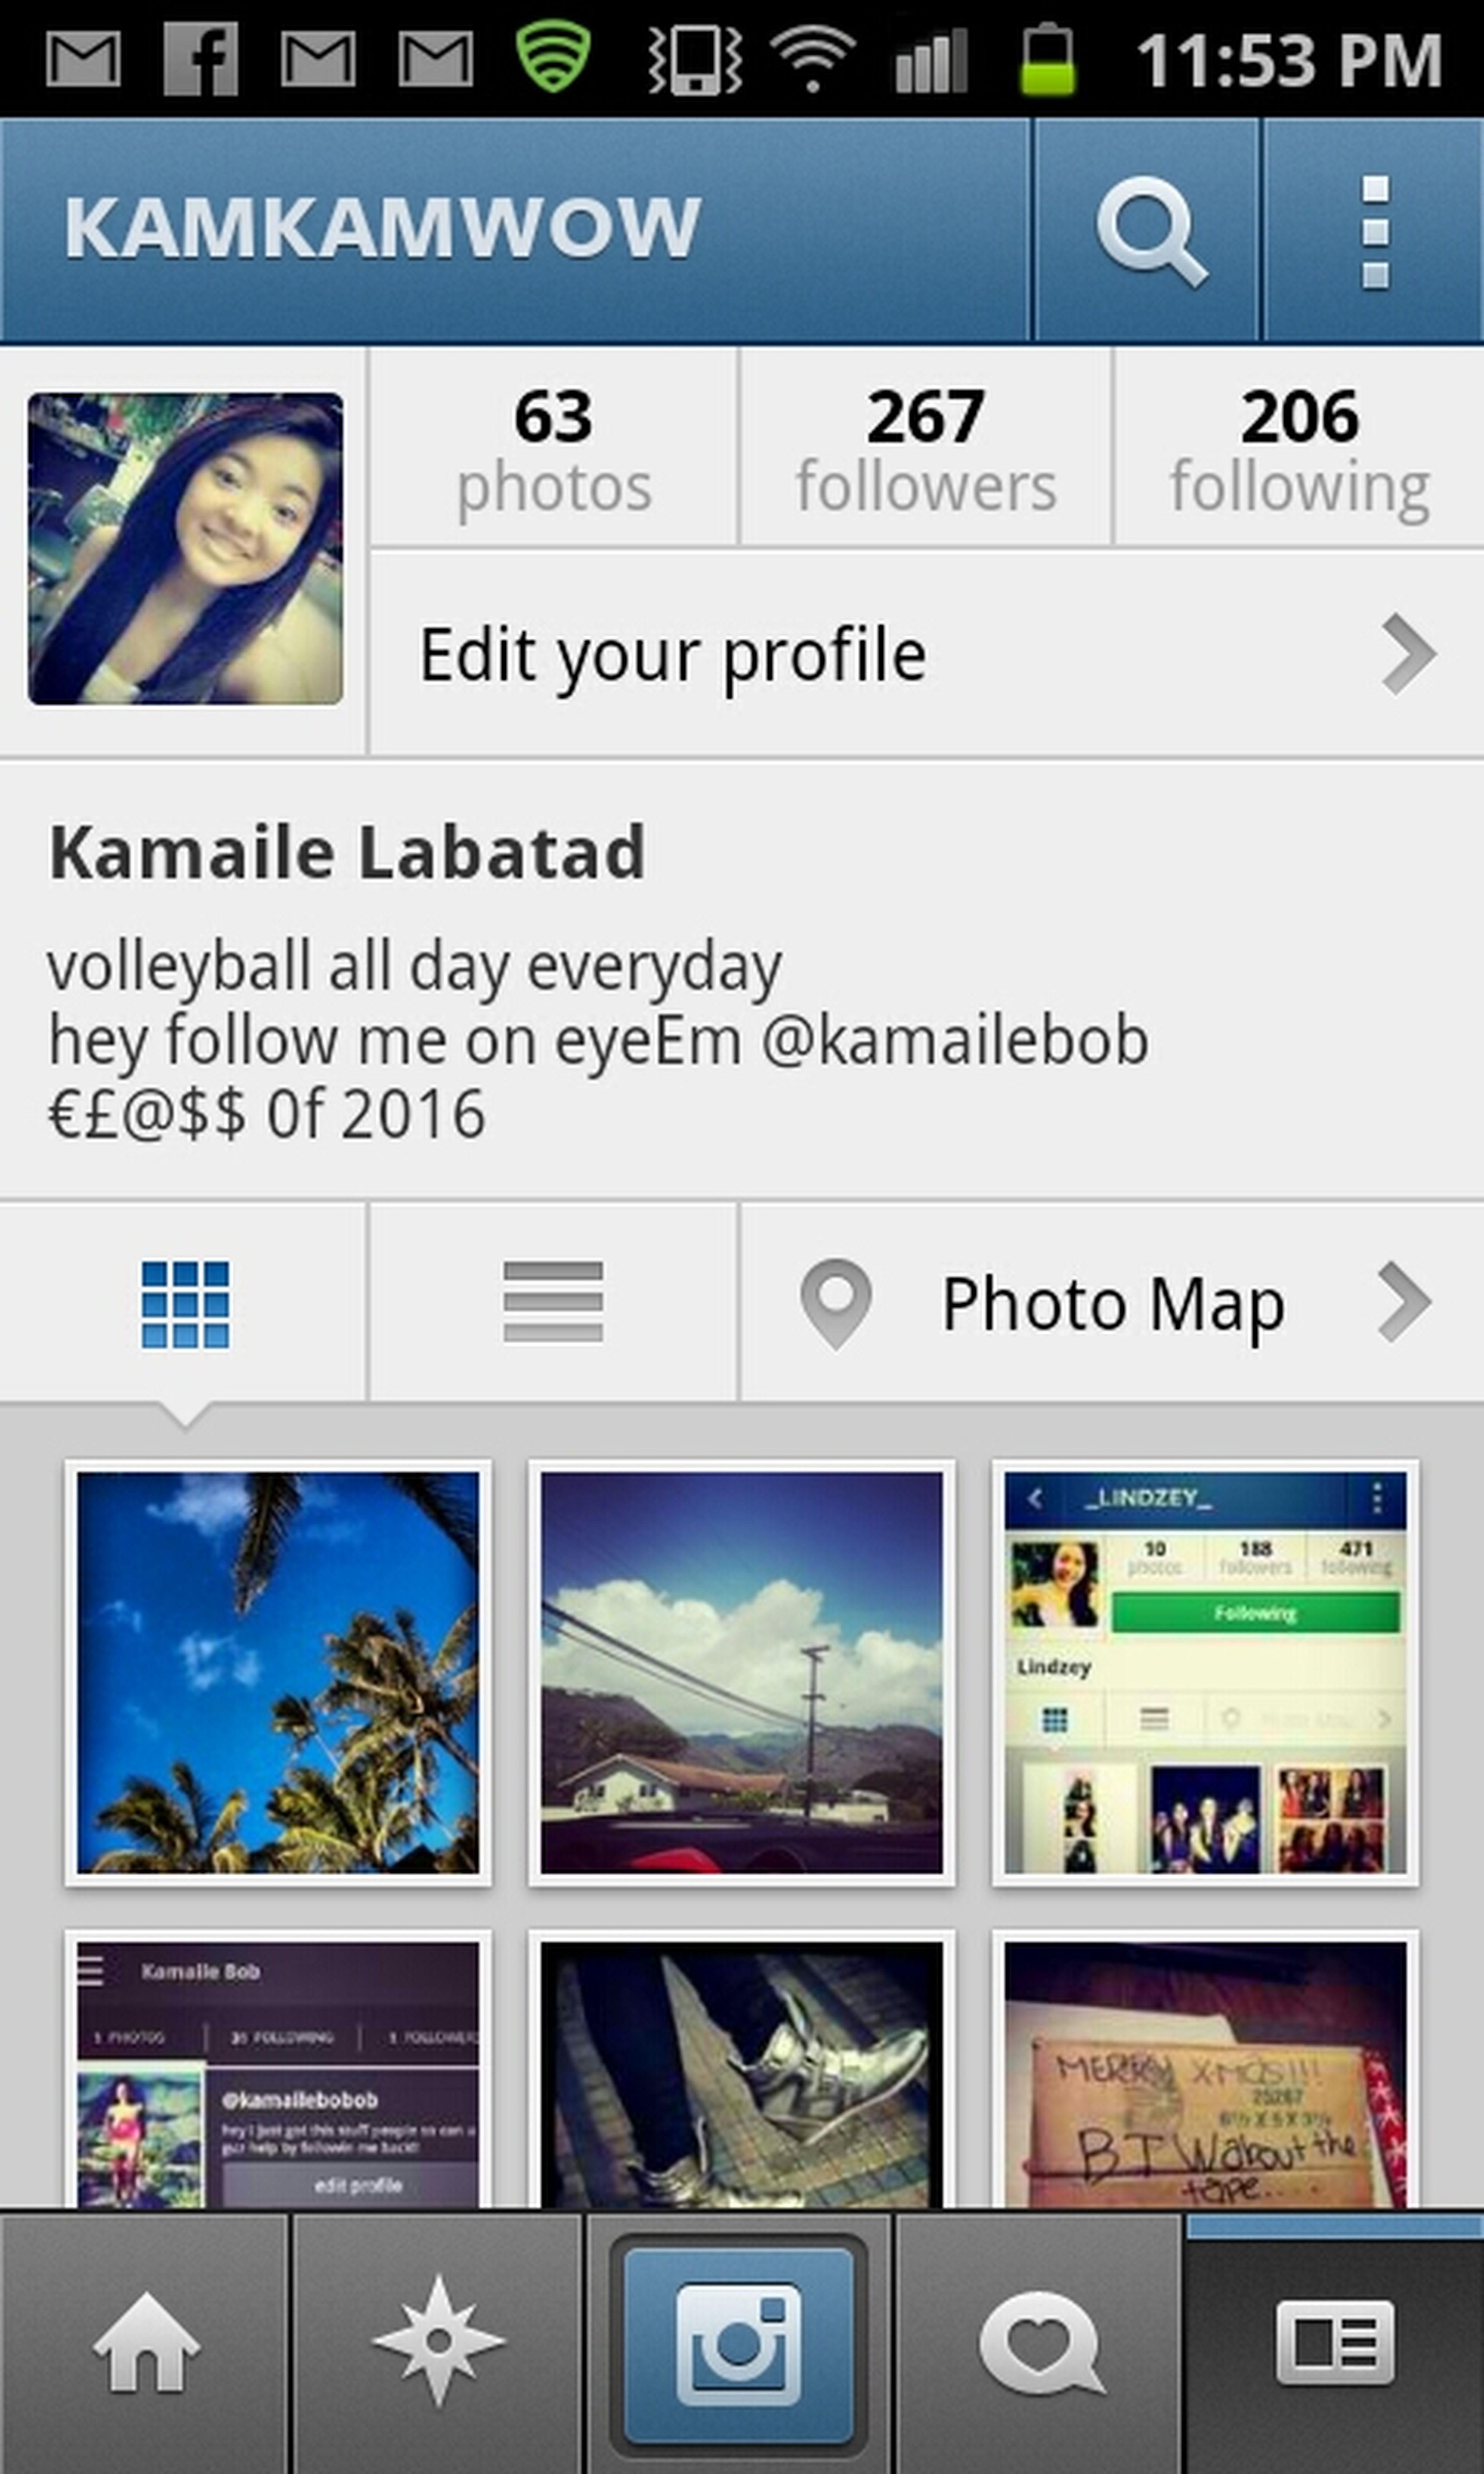 Since You Beautifull Peepl Followin Me Go Follow Me On INSTAAAA-G